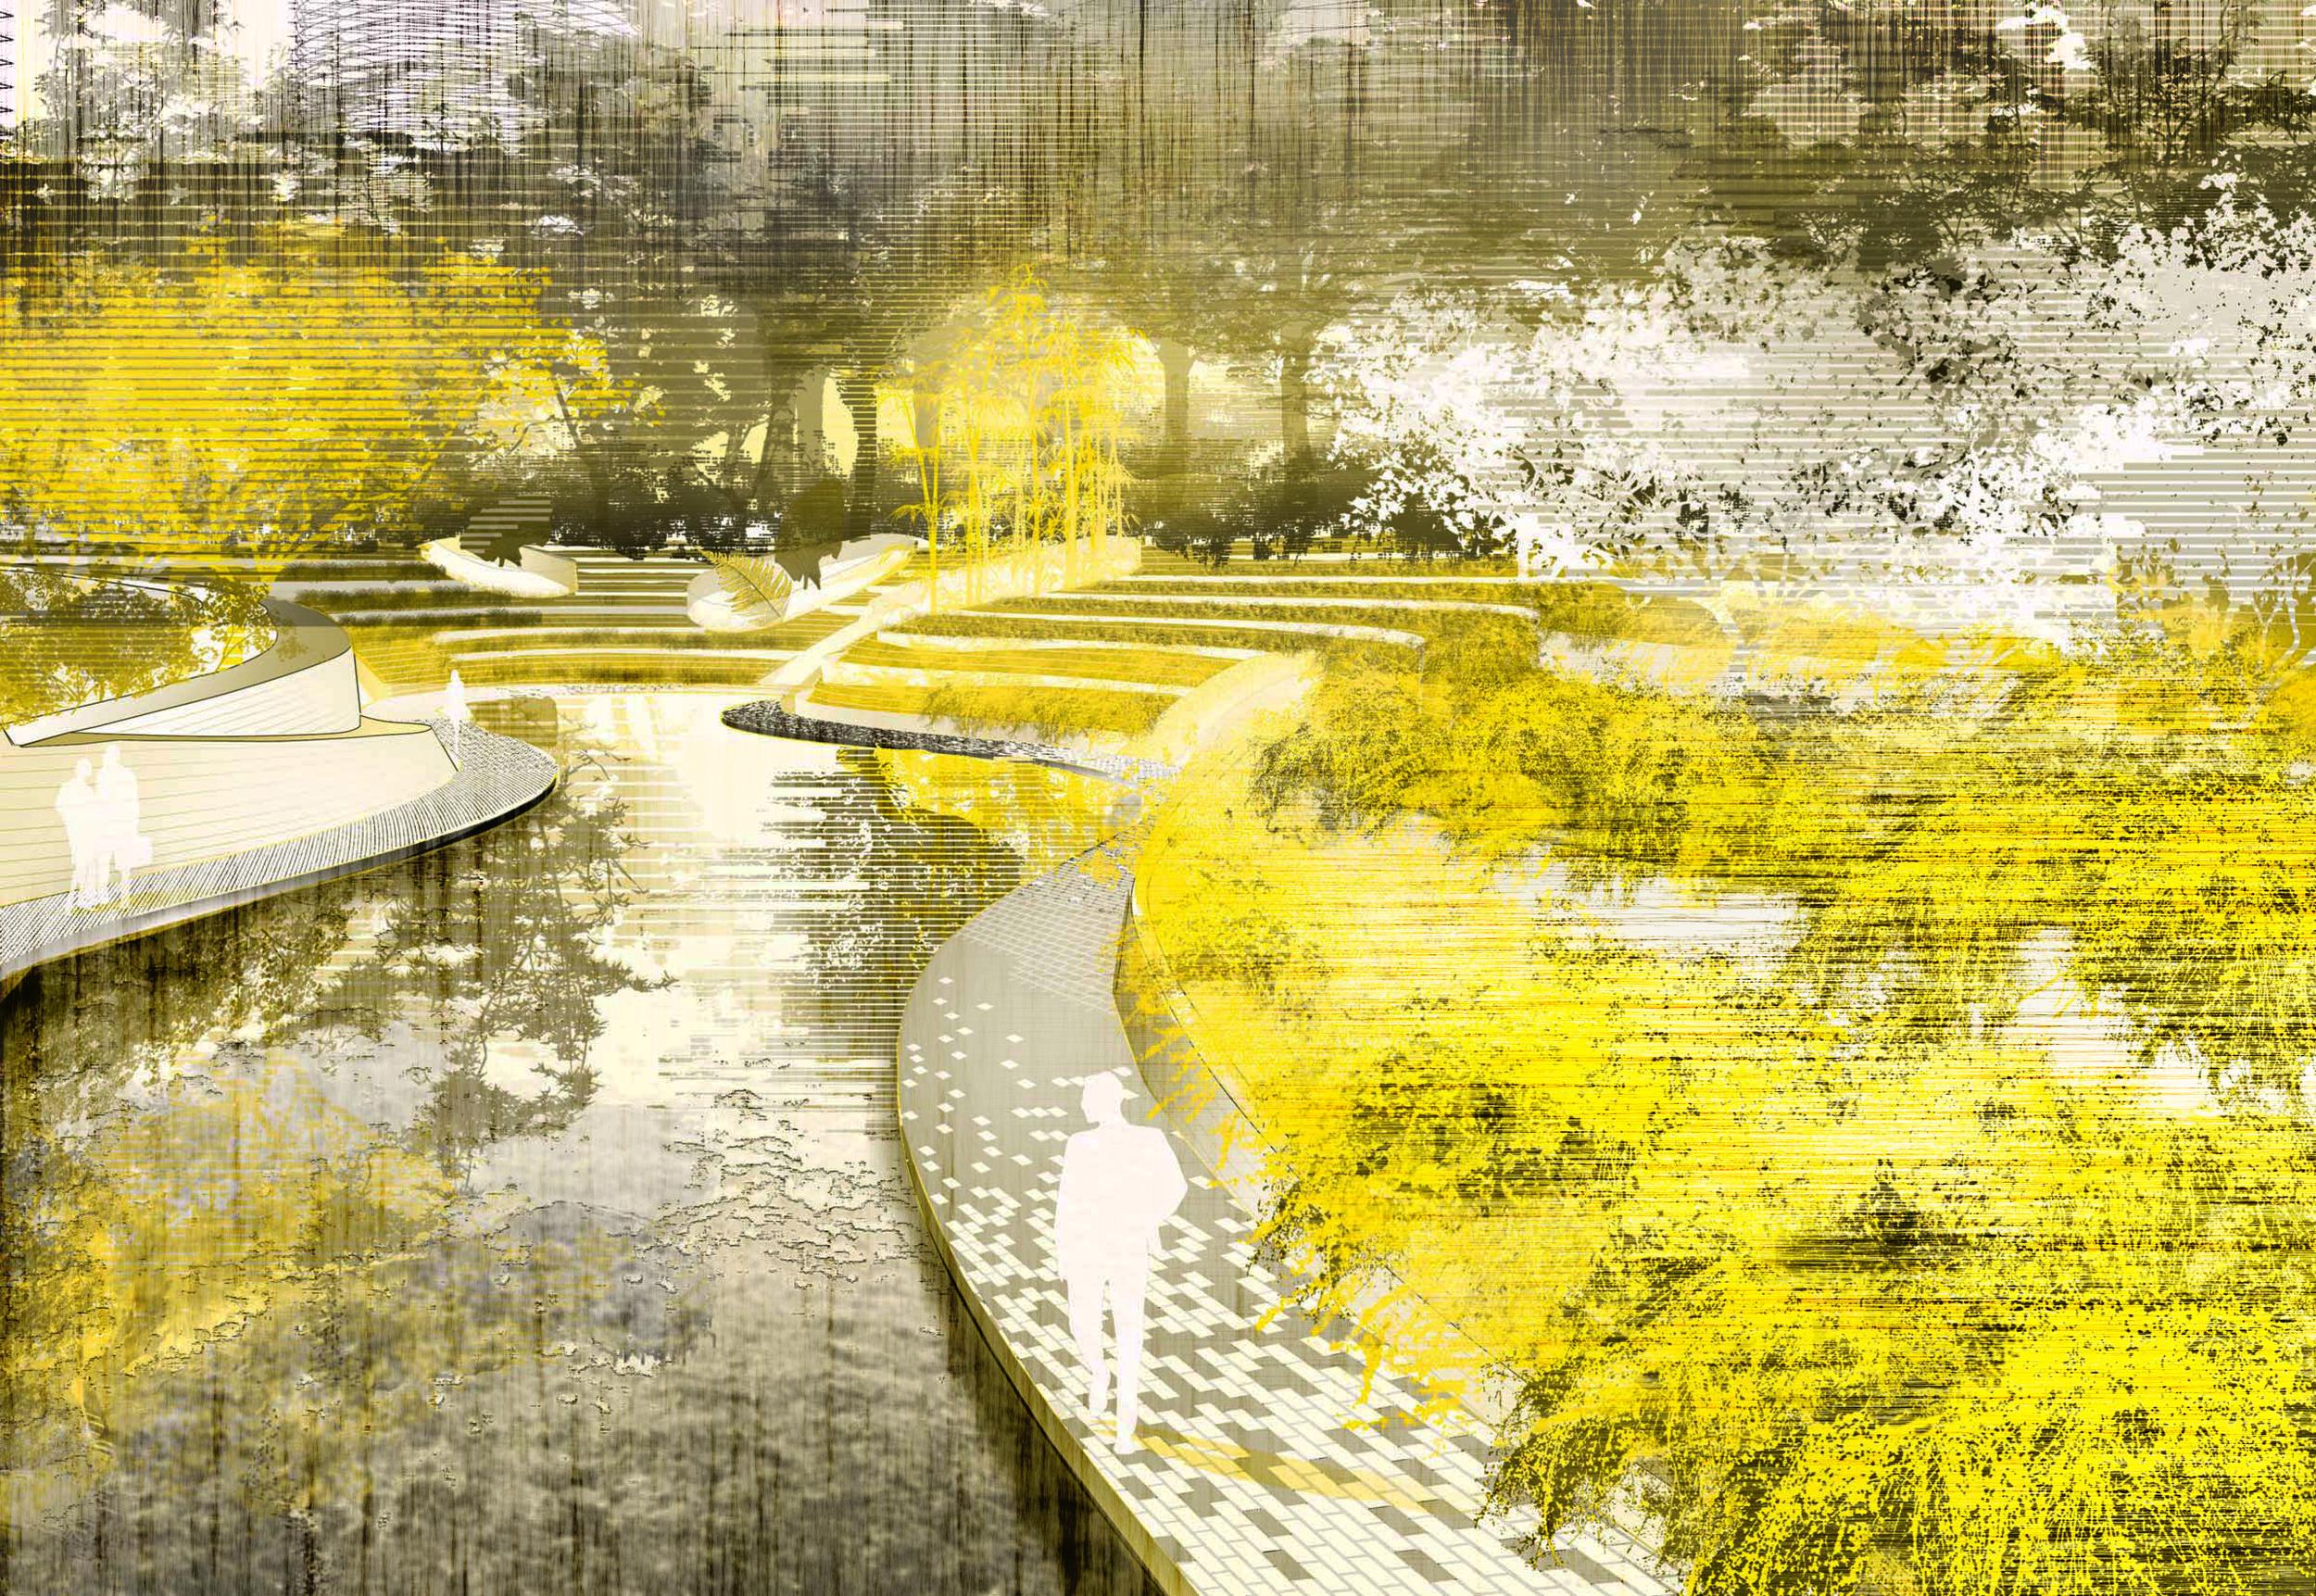 BA_tongshanjie_view sunken garden.jpg